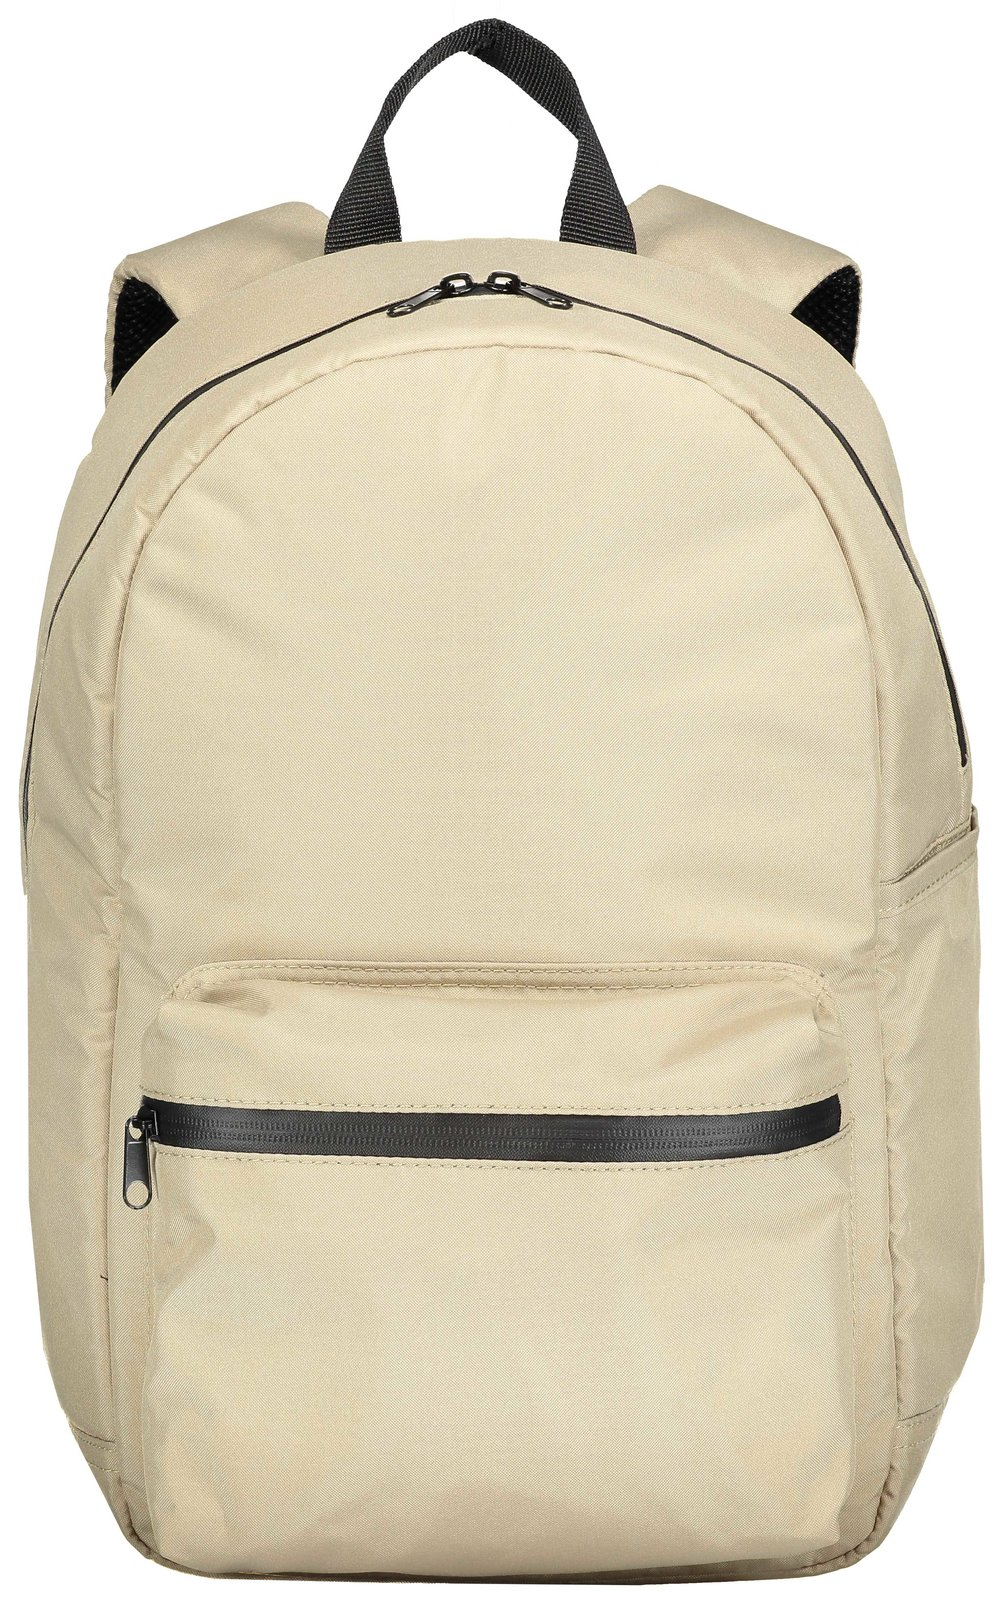 rucksack-2_Front.jpg